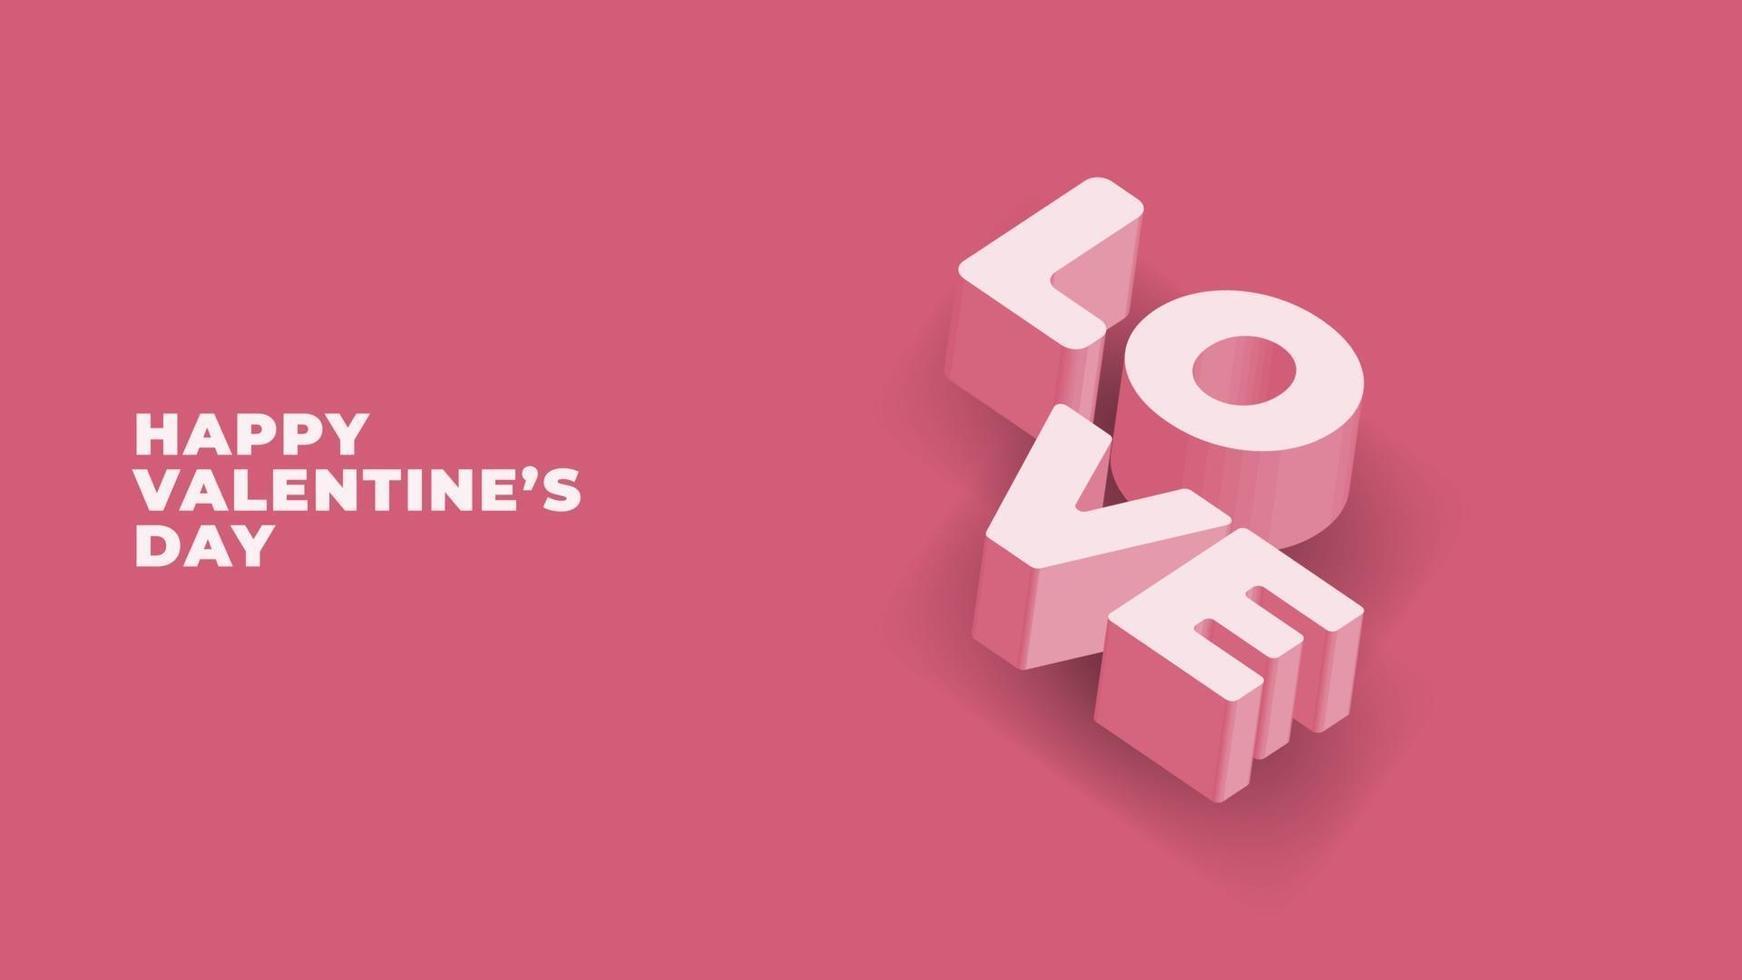 Happy valentines day 3d vector